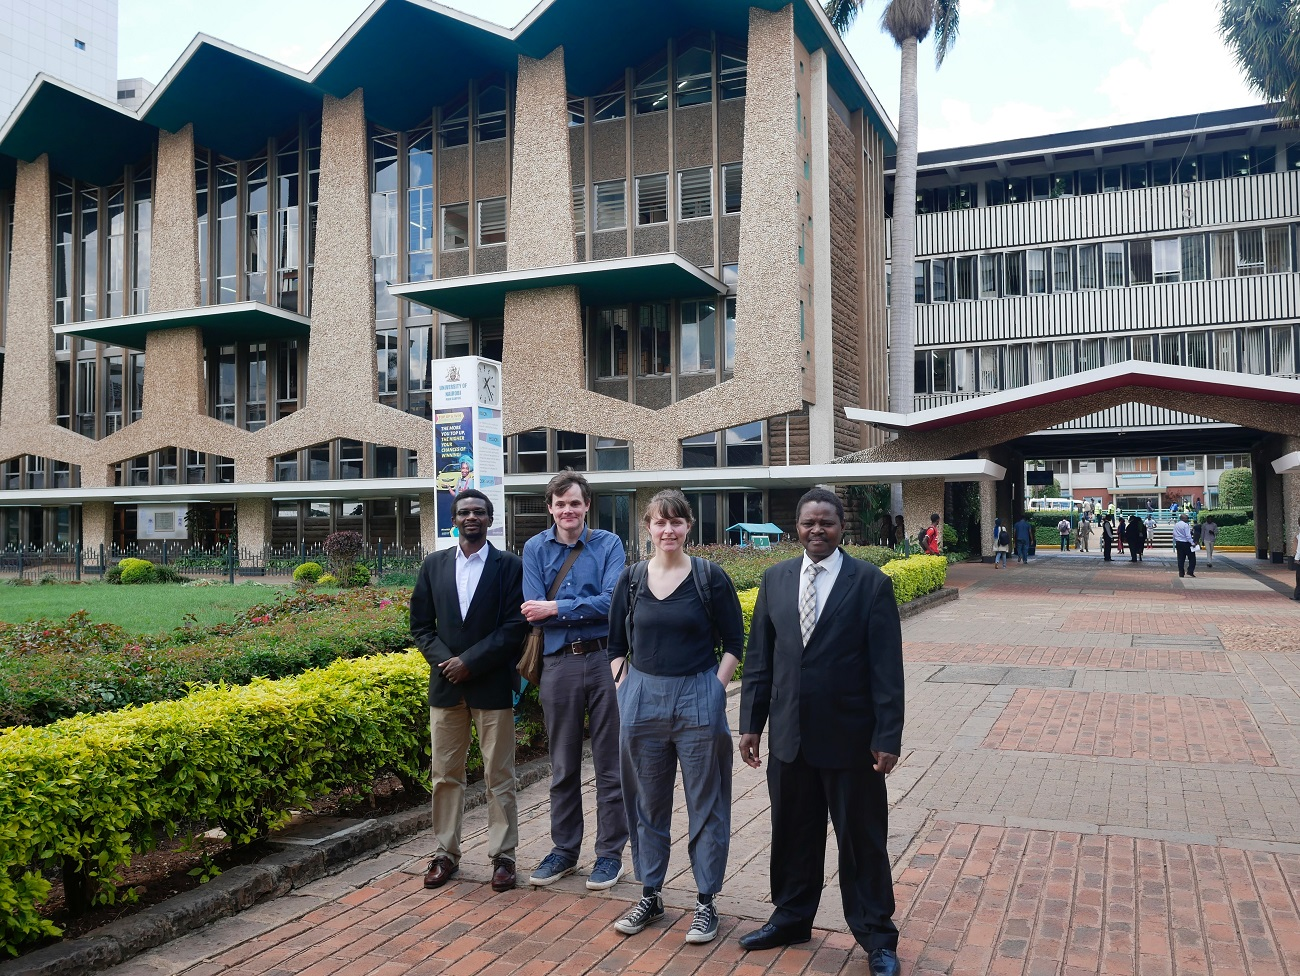 Universities in Kenya: List of Public and Private Universities